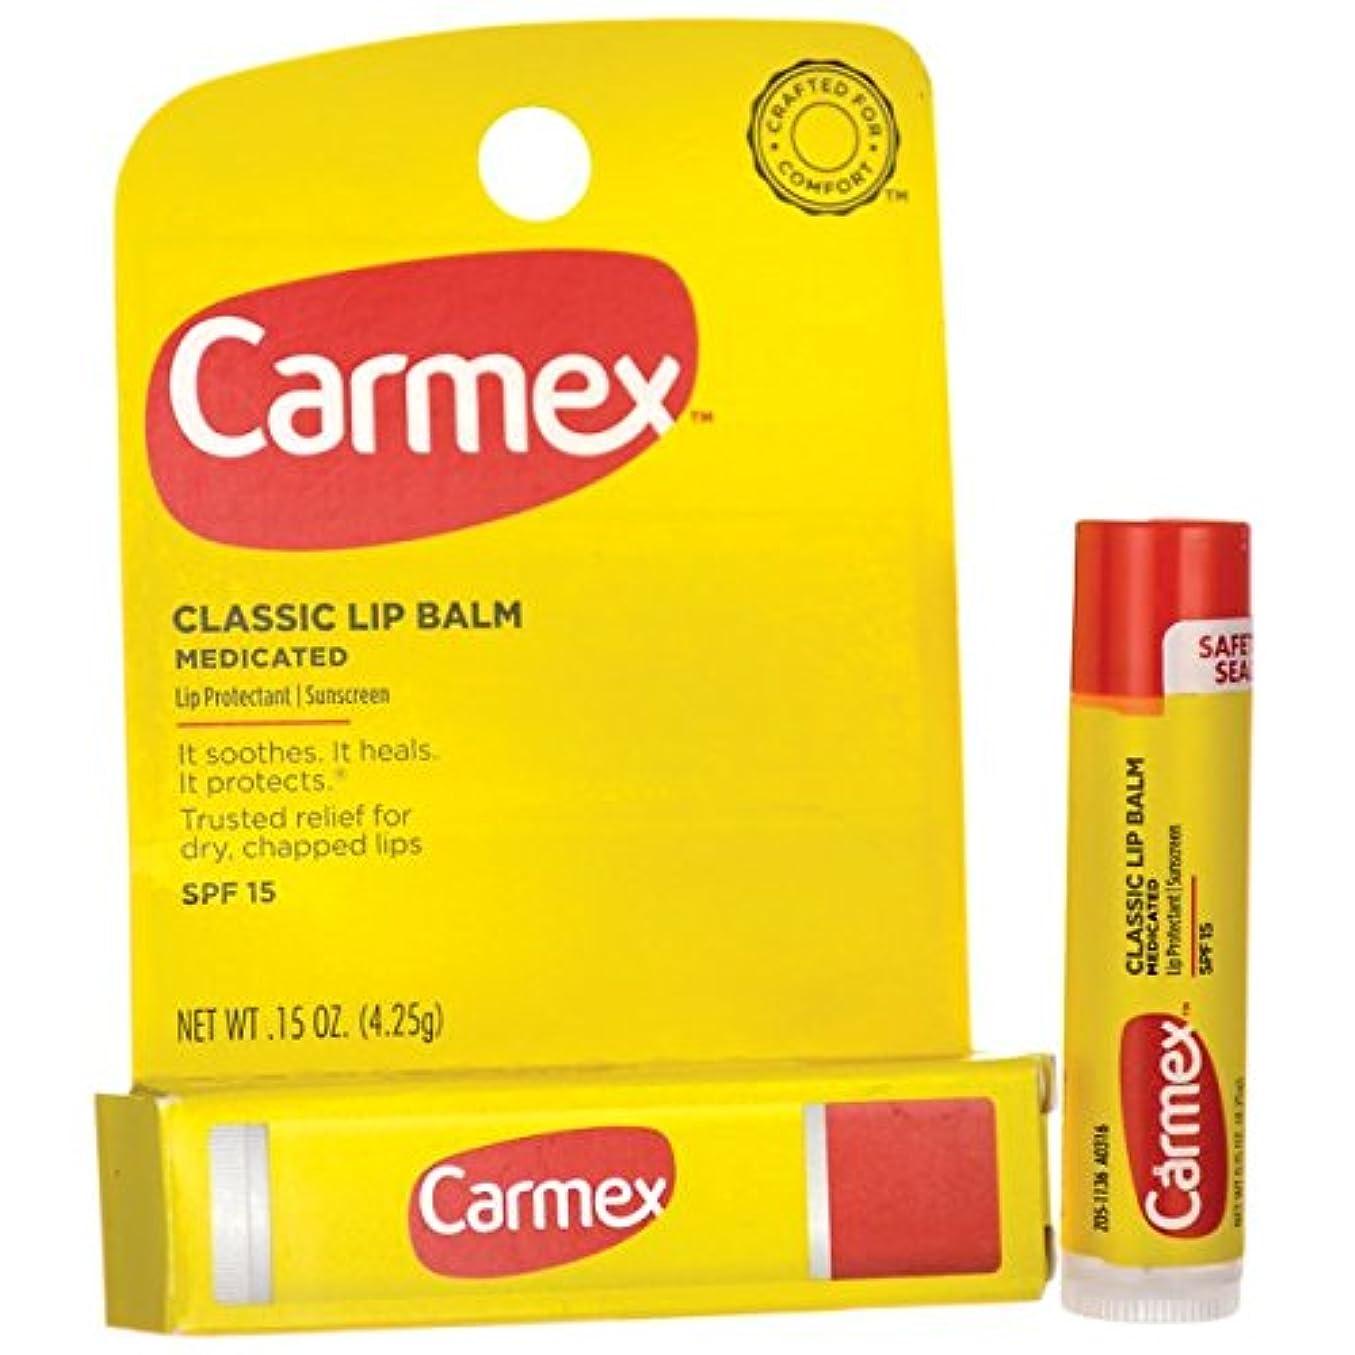 間欠練習十年Carmex Lip Moisturizing Click-Stick With Sunscreen SPF#15 Original Balm (Pack of 12) (並行輸入品)